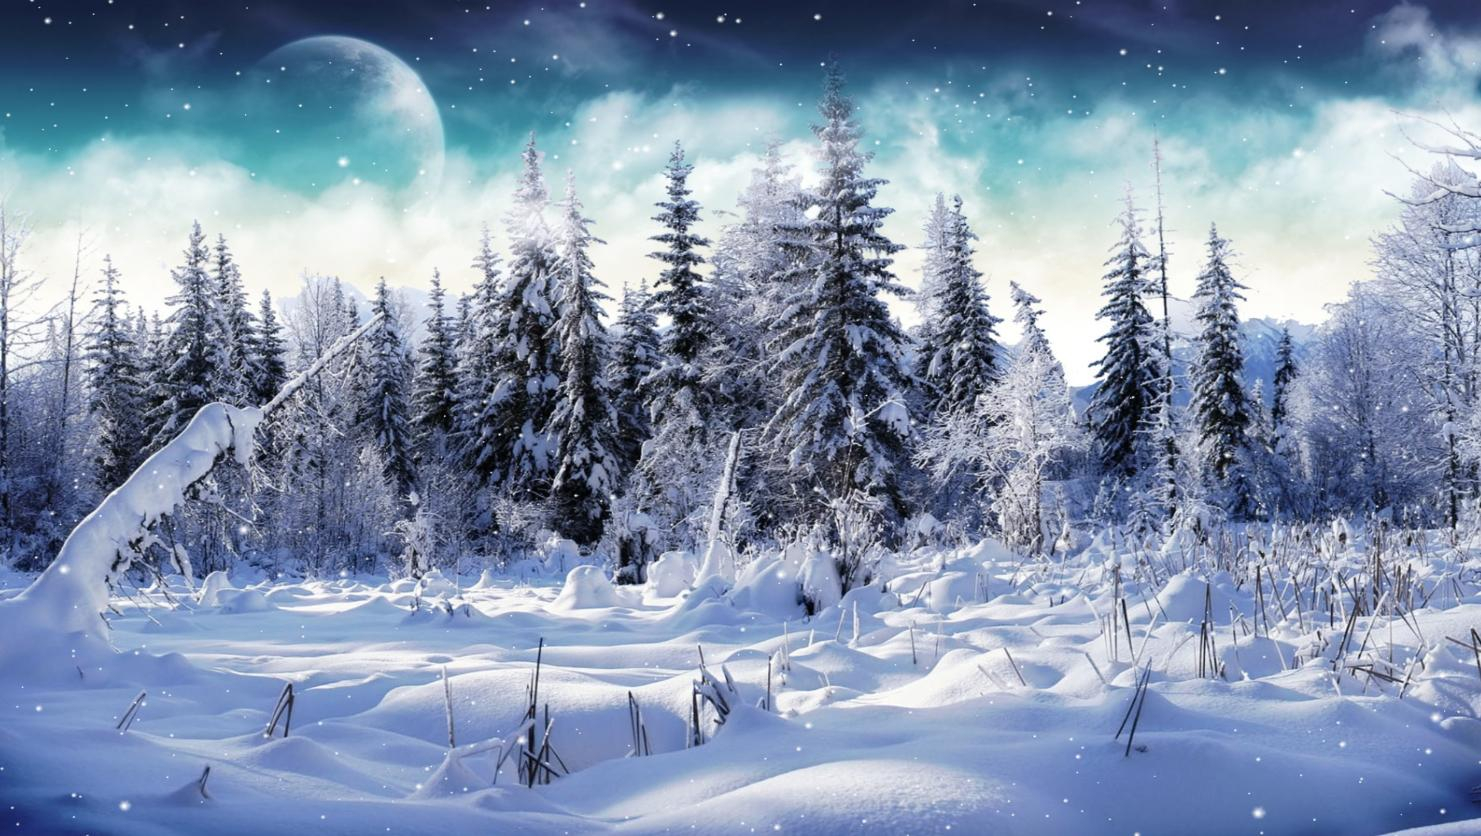 Cold Winter Screensaver   Animated Wallpaper[h33t][Screensavers 1481x836